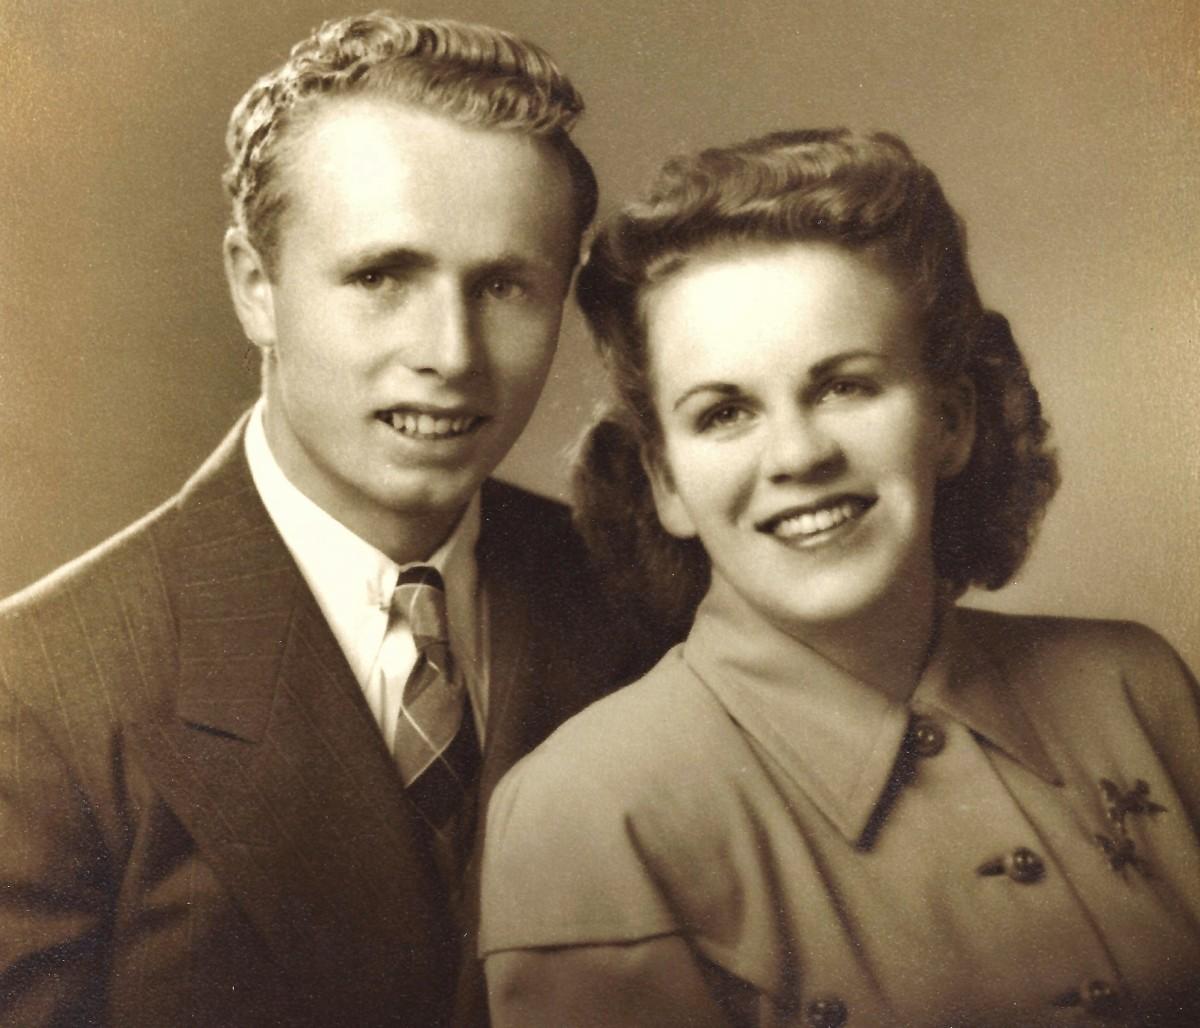 One of my parent's wedding photos, 1946